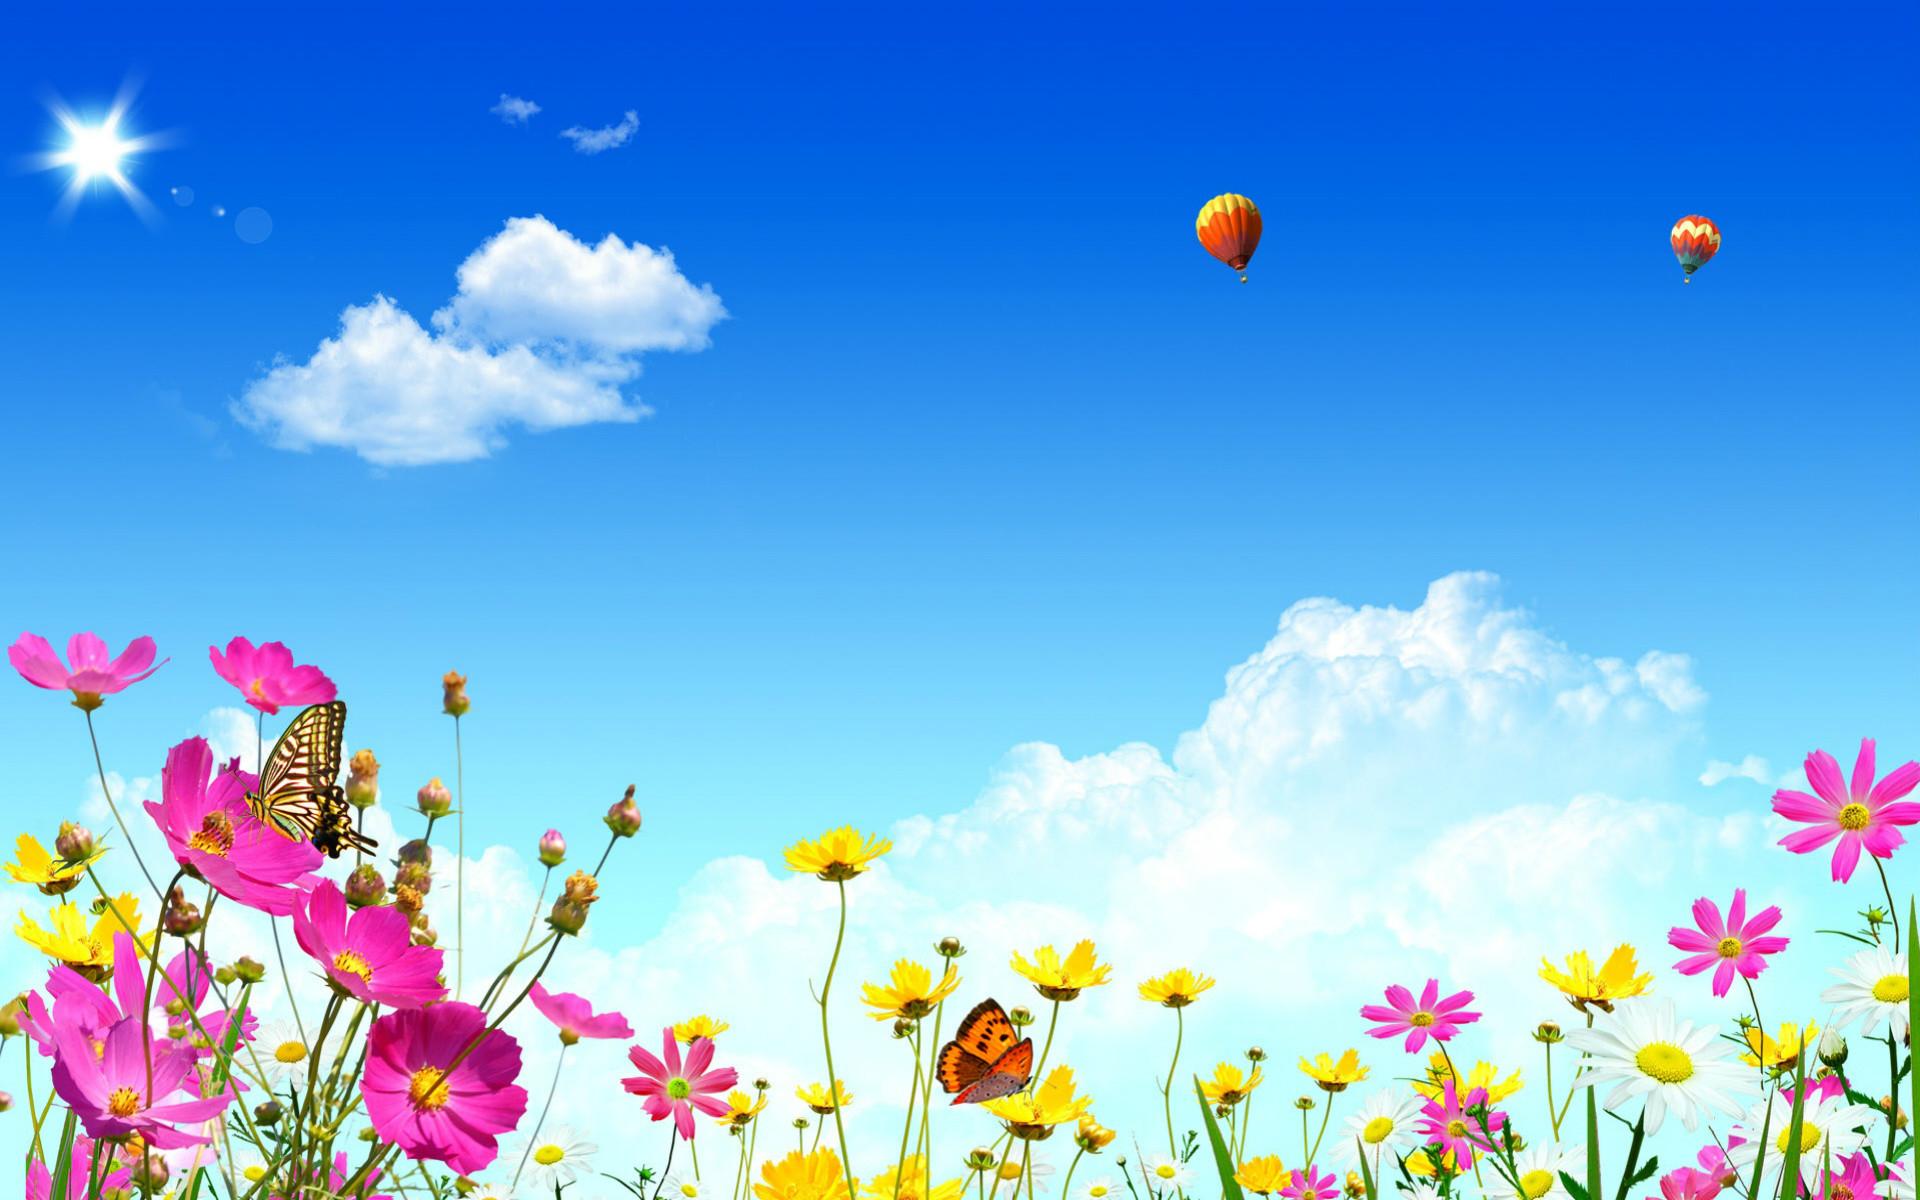 Spring Desktop Wallpaper Screensaver 56 Images